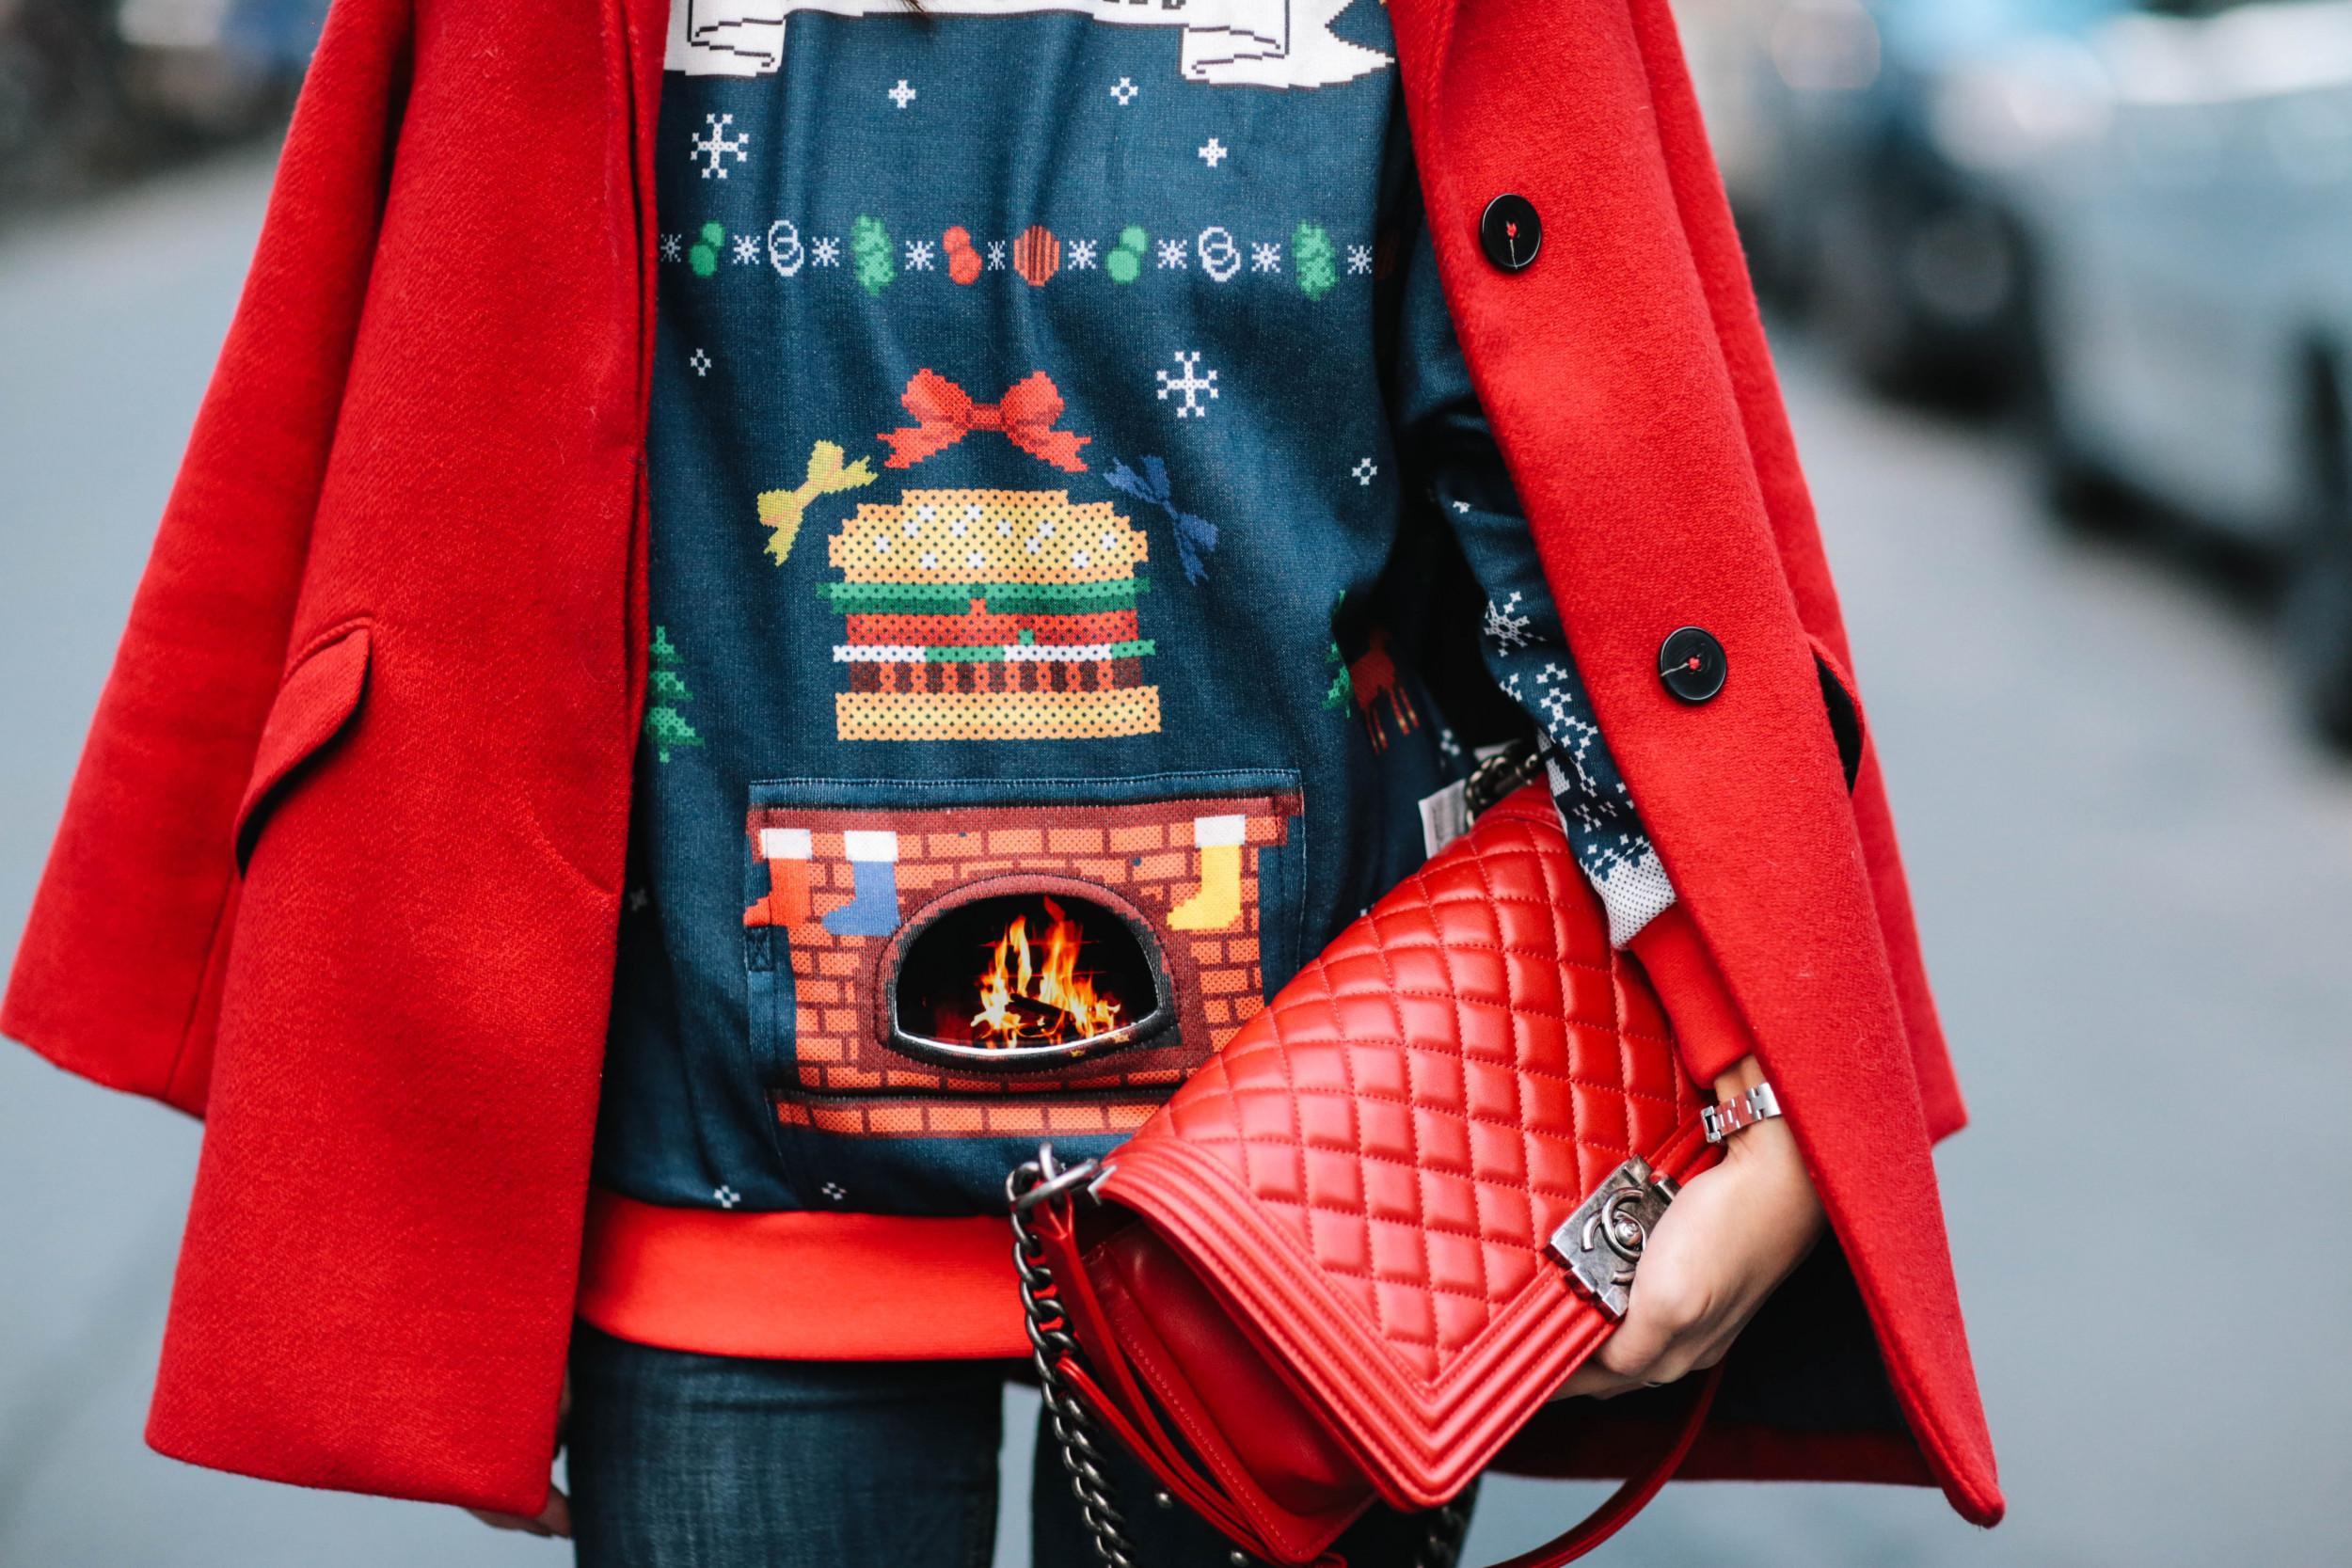 NUCOVASUTEE Dasher Dancer Prancer Vixen Comet Cupid Ugly Christmas T-Shirt